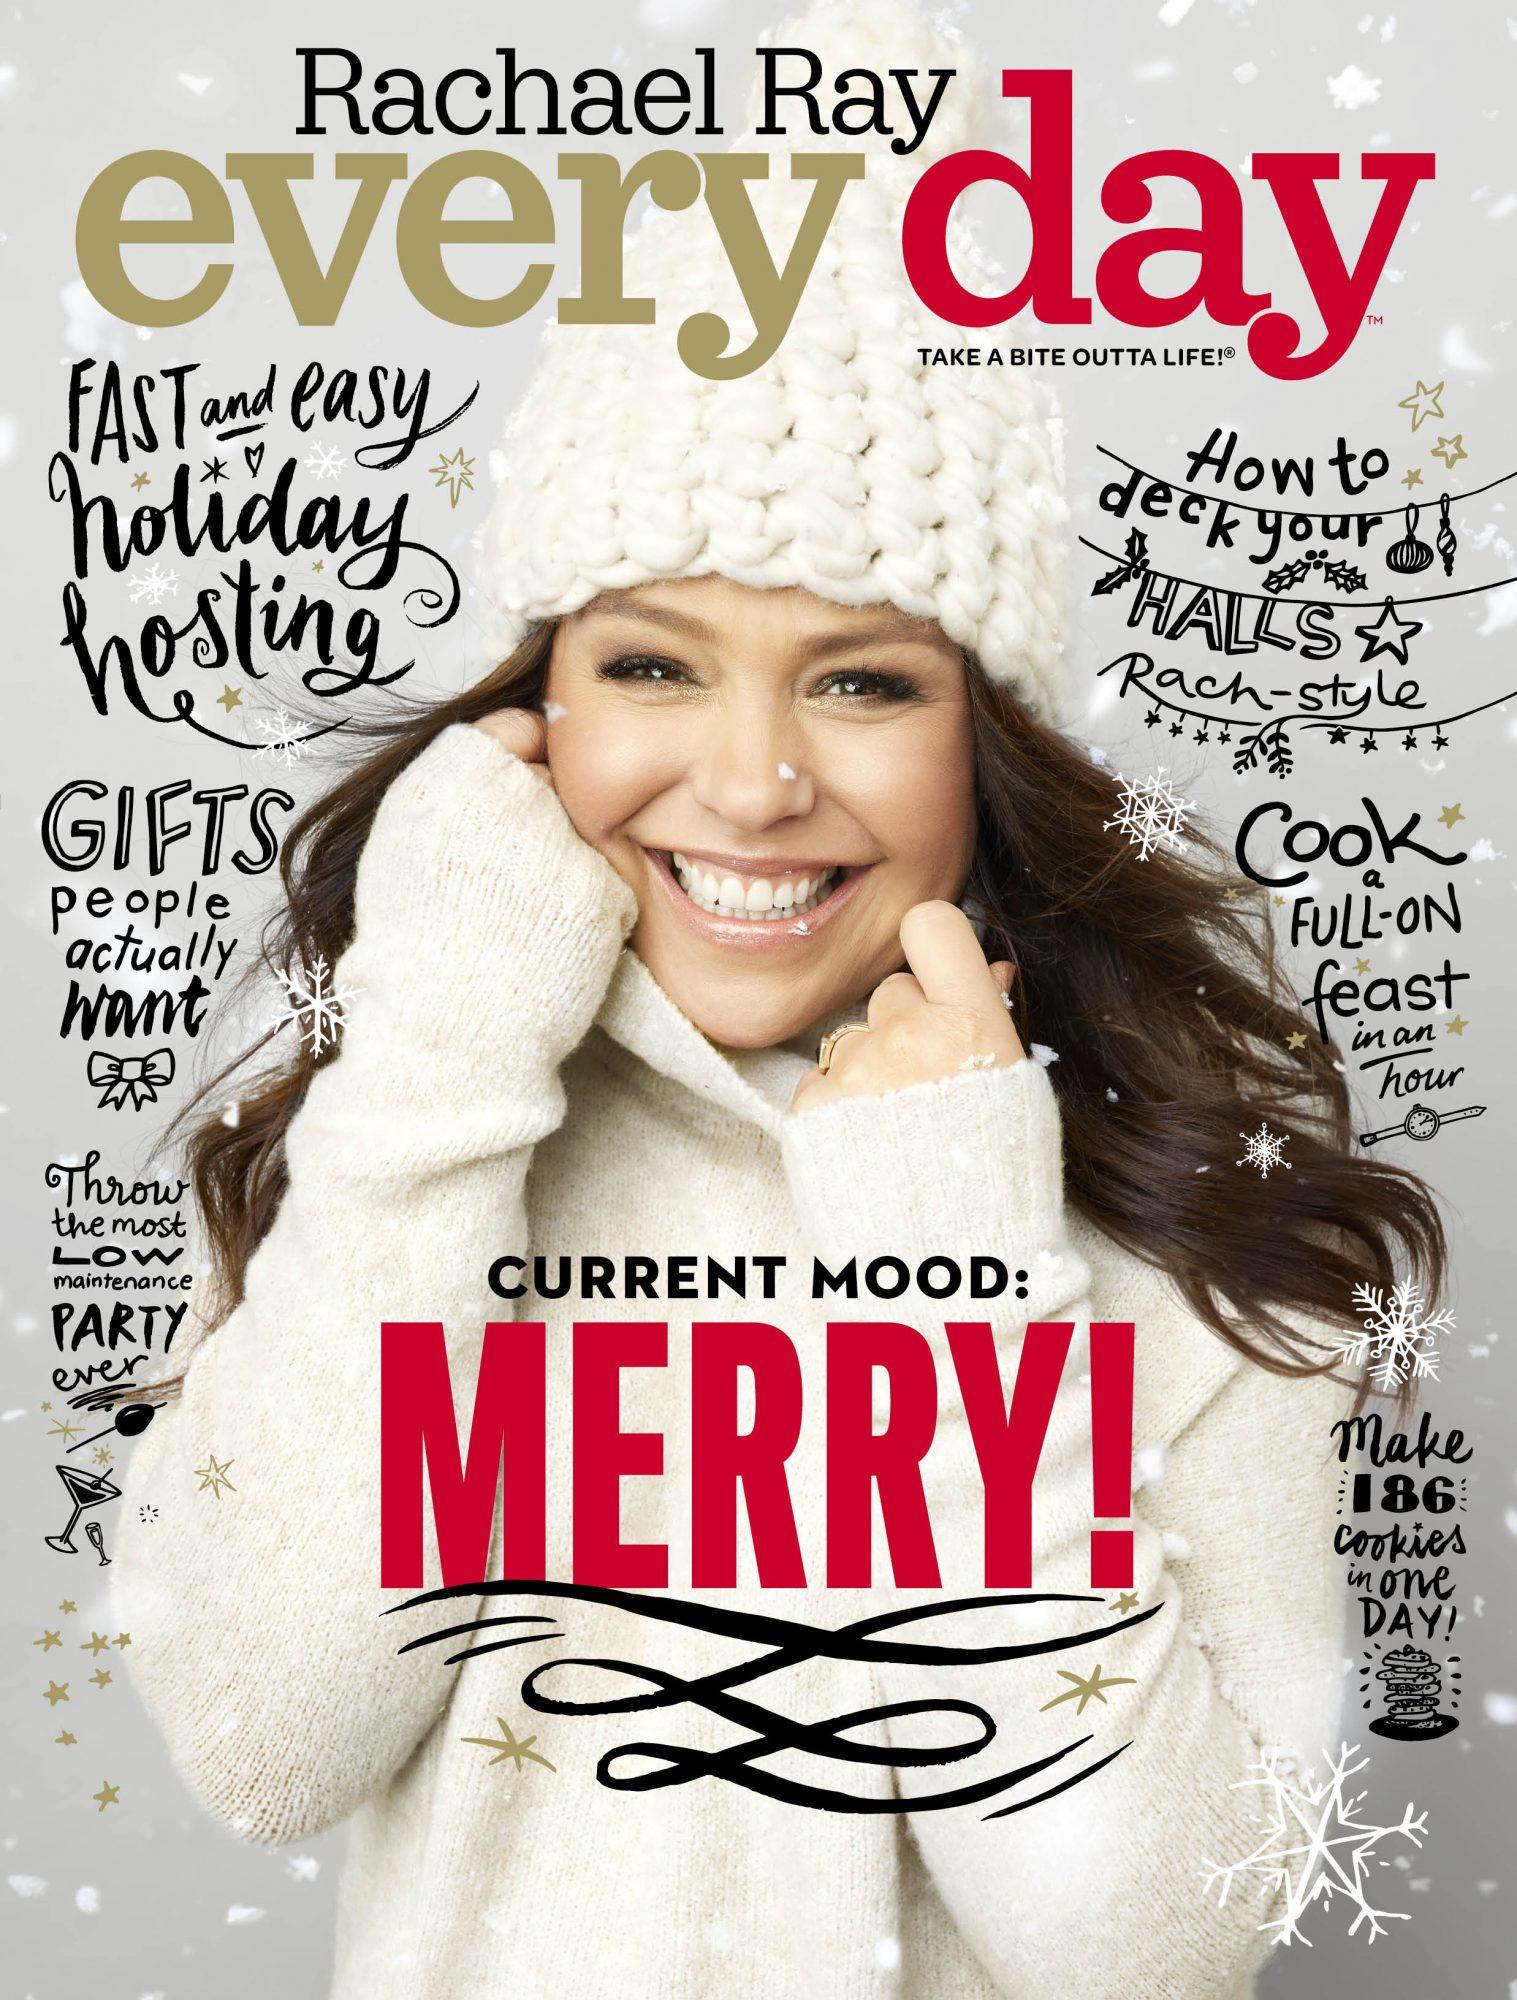 Rachael Ray December 2017 cover